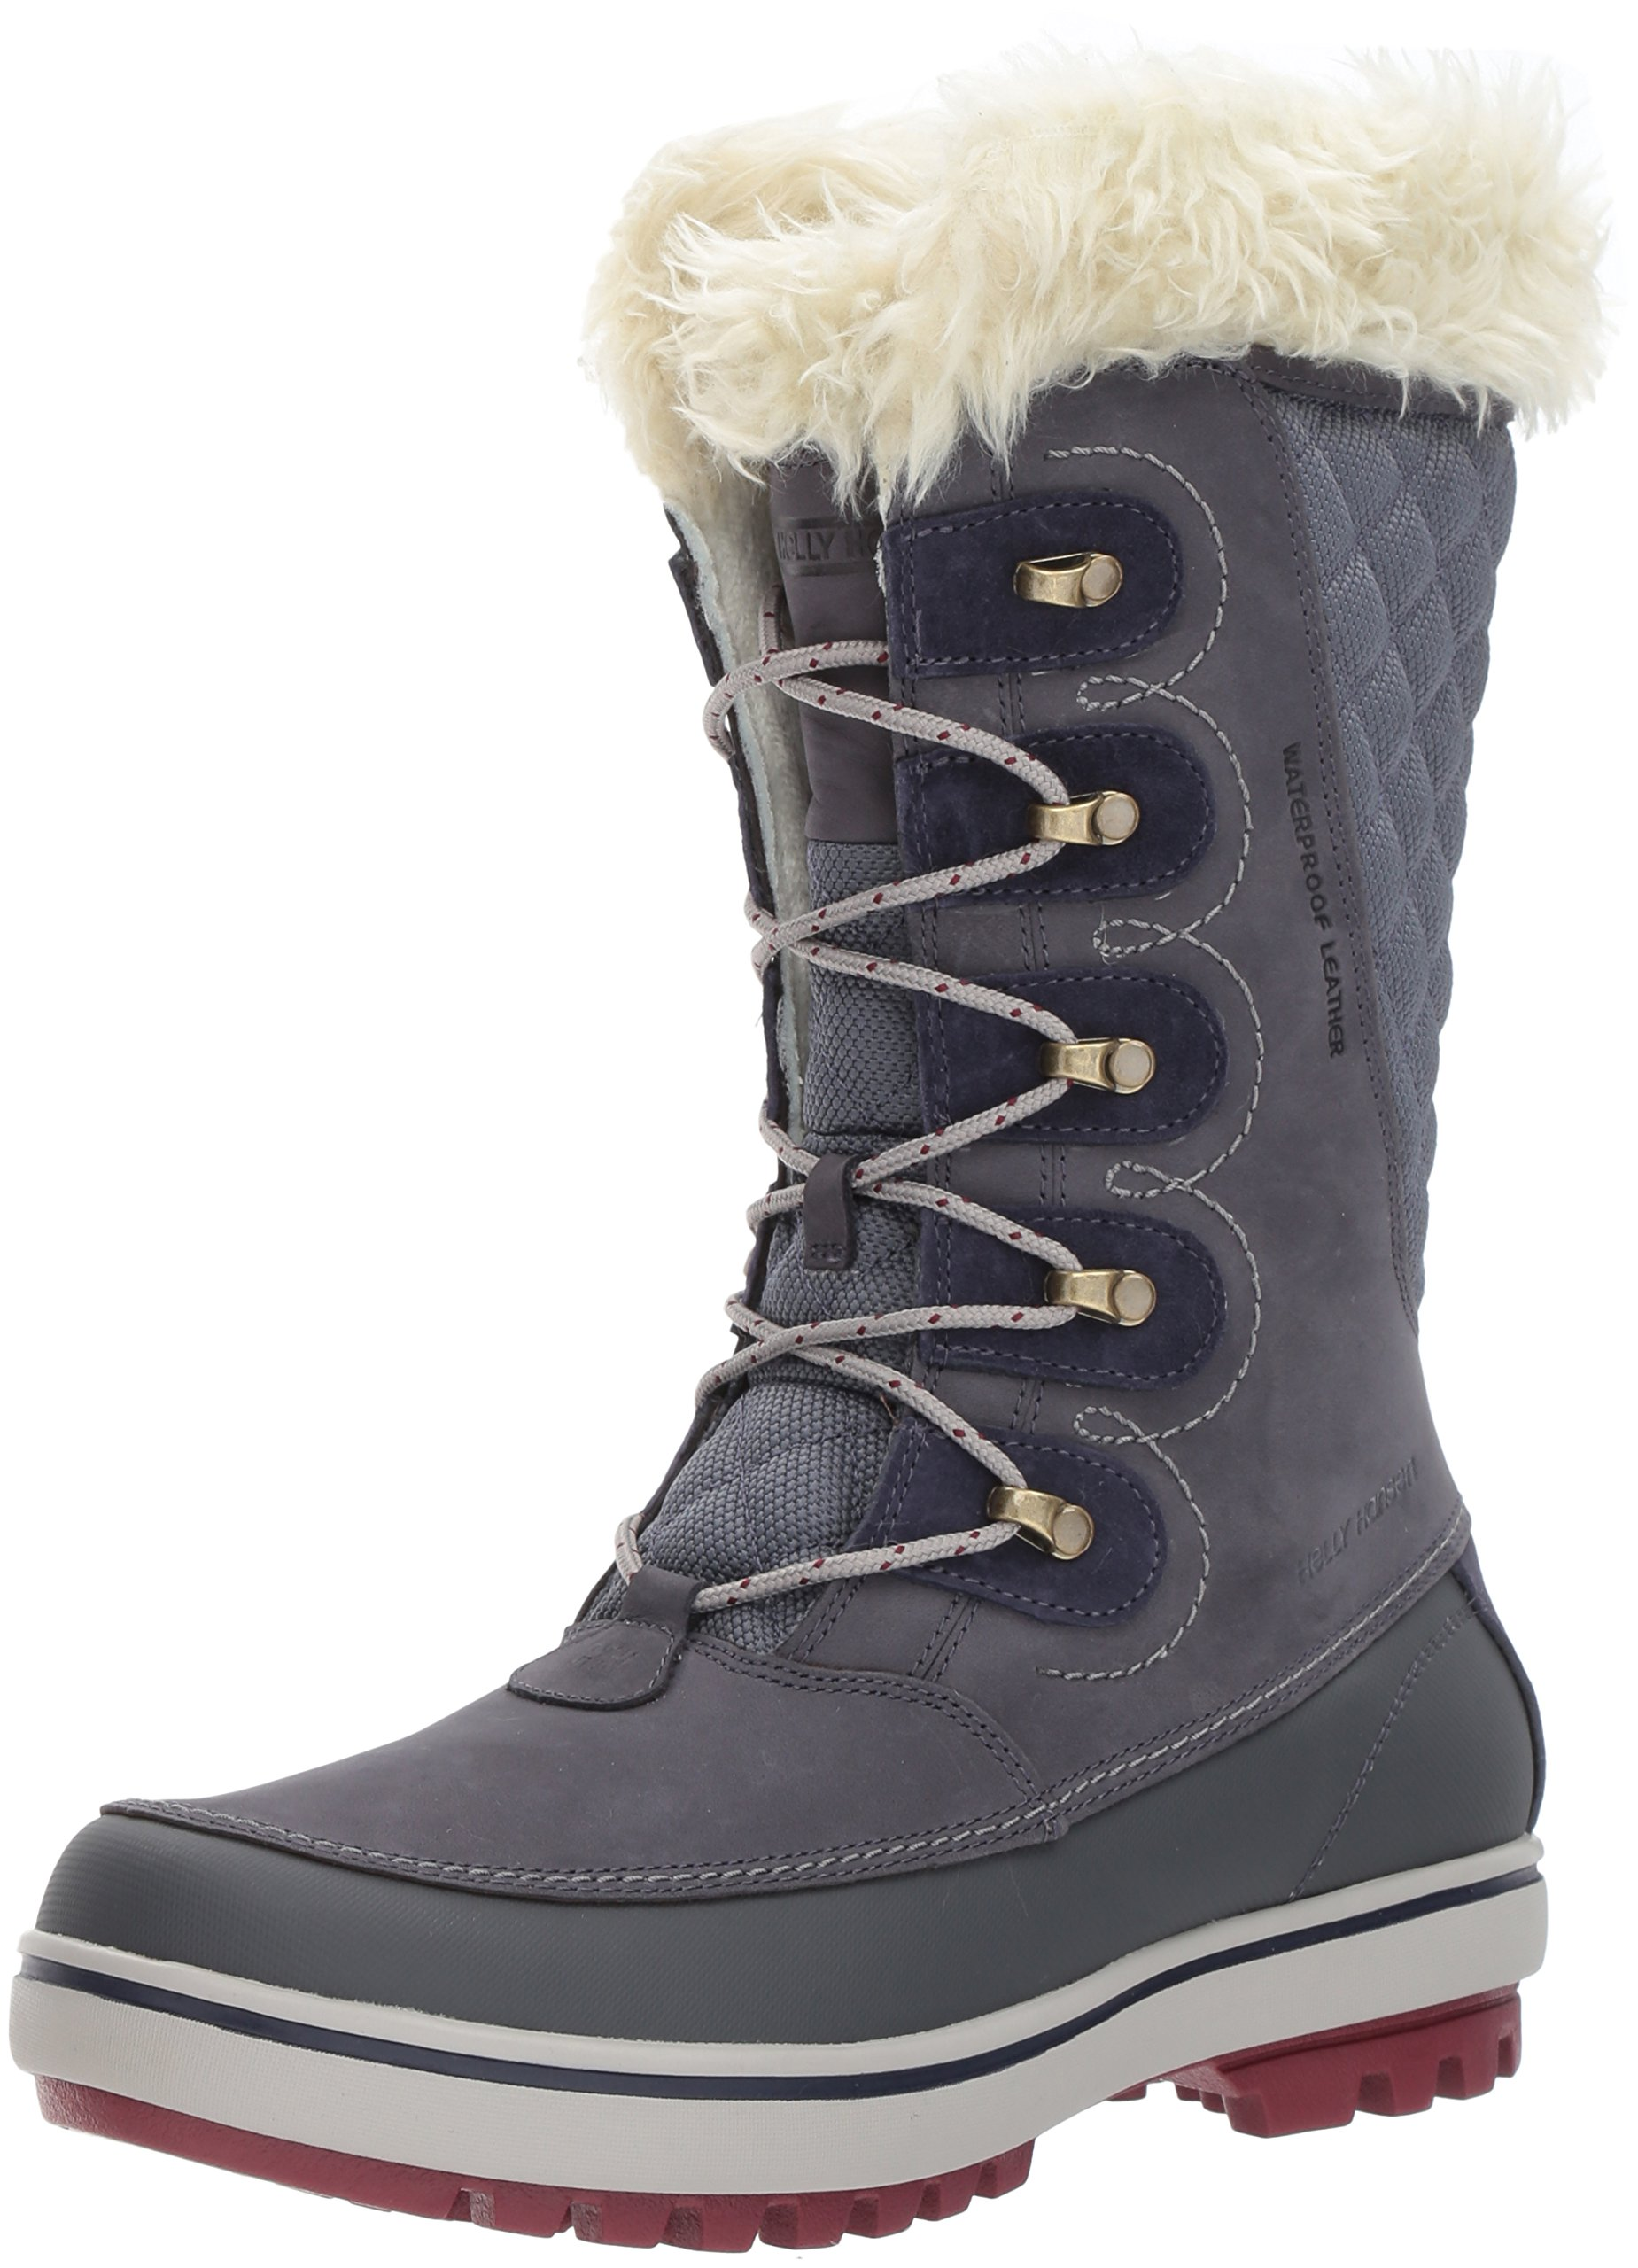 Helly Hansen Women's Garibaldi Snow Boot, Graphite Blue/Ebony/Ne, 6.5 M US